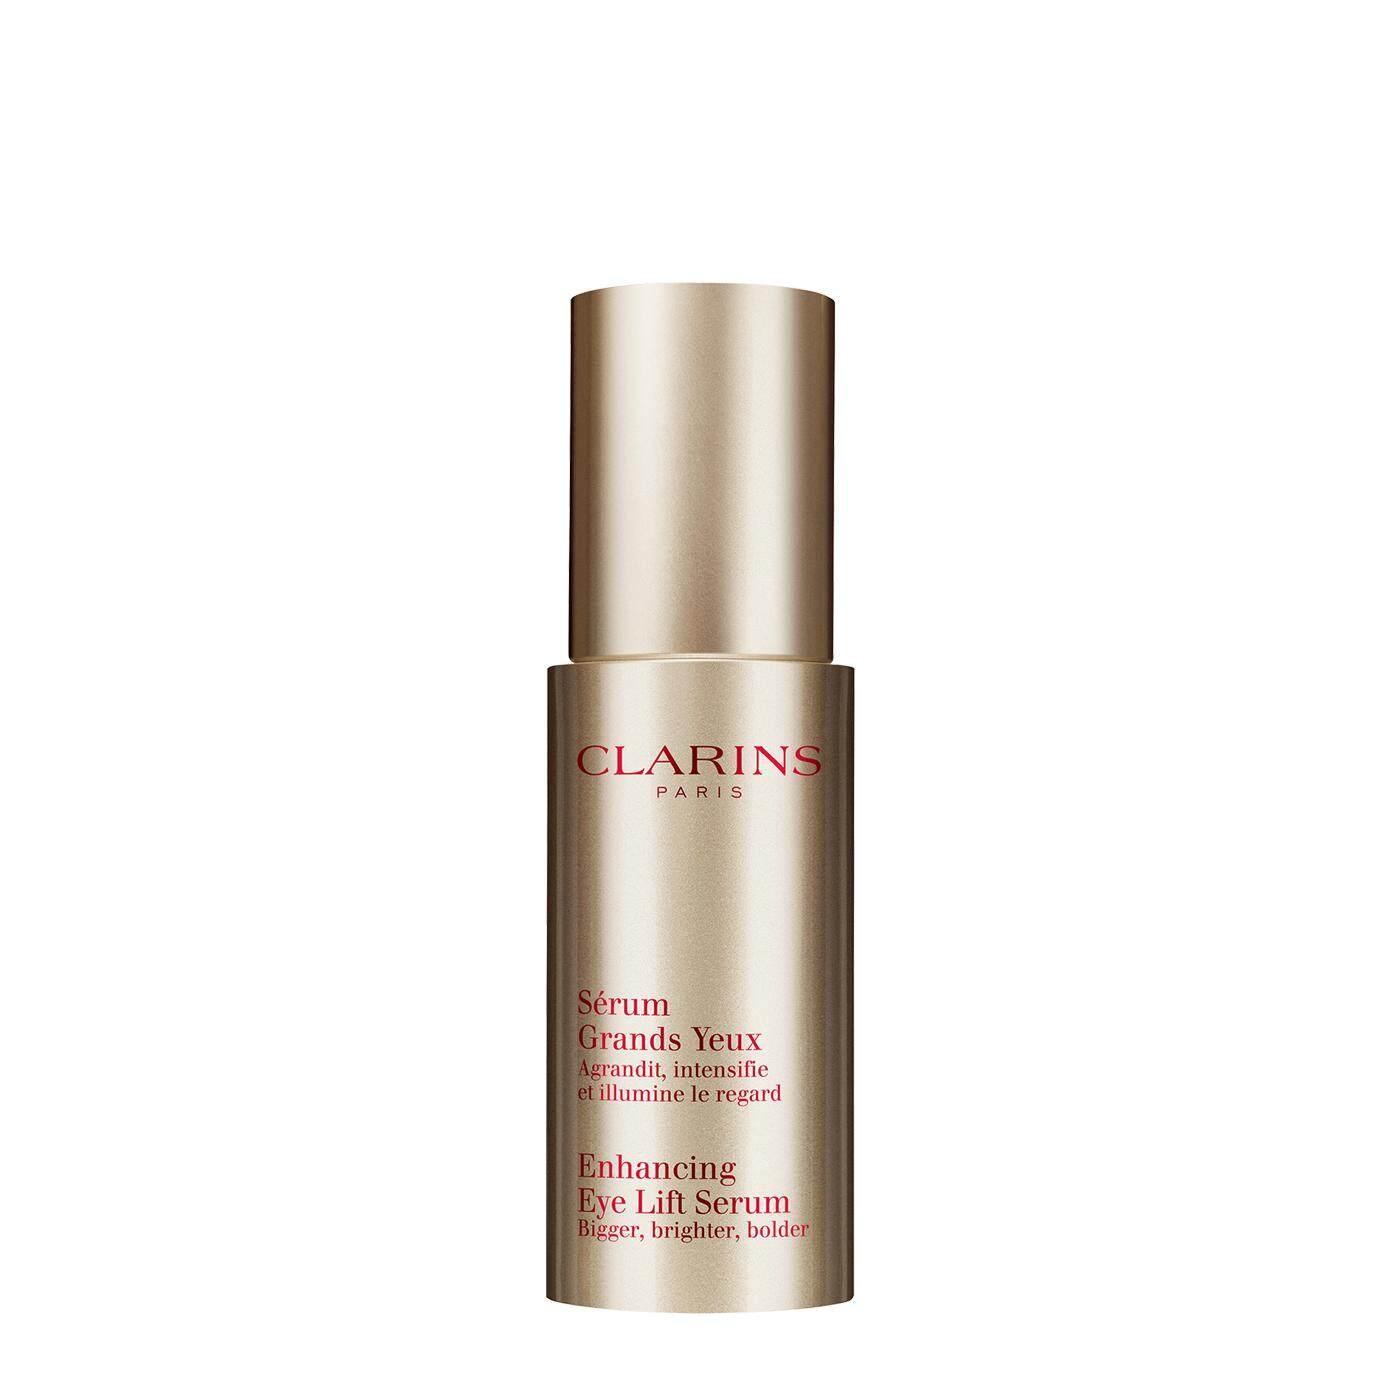 Clarins Enhancing Eye Lift Serum 15ml No Box